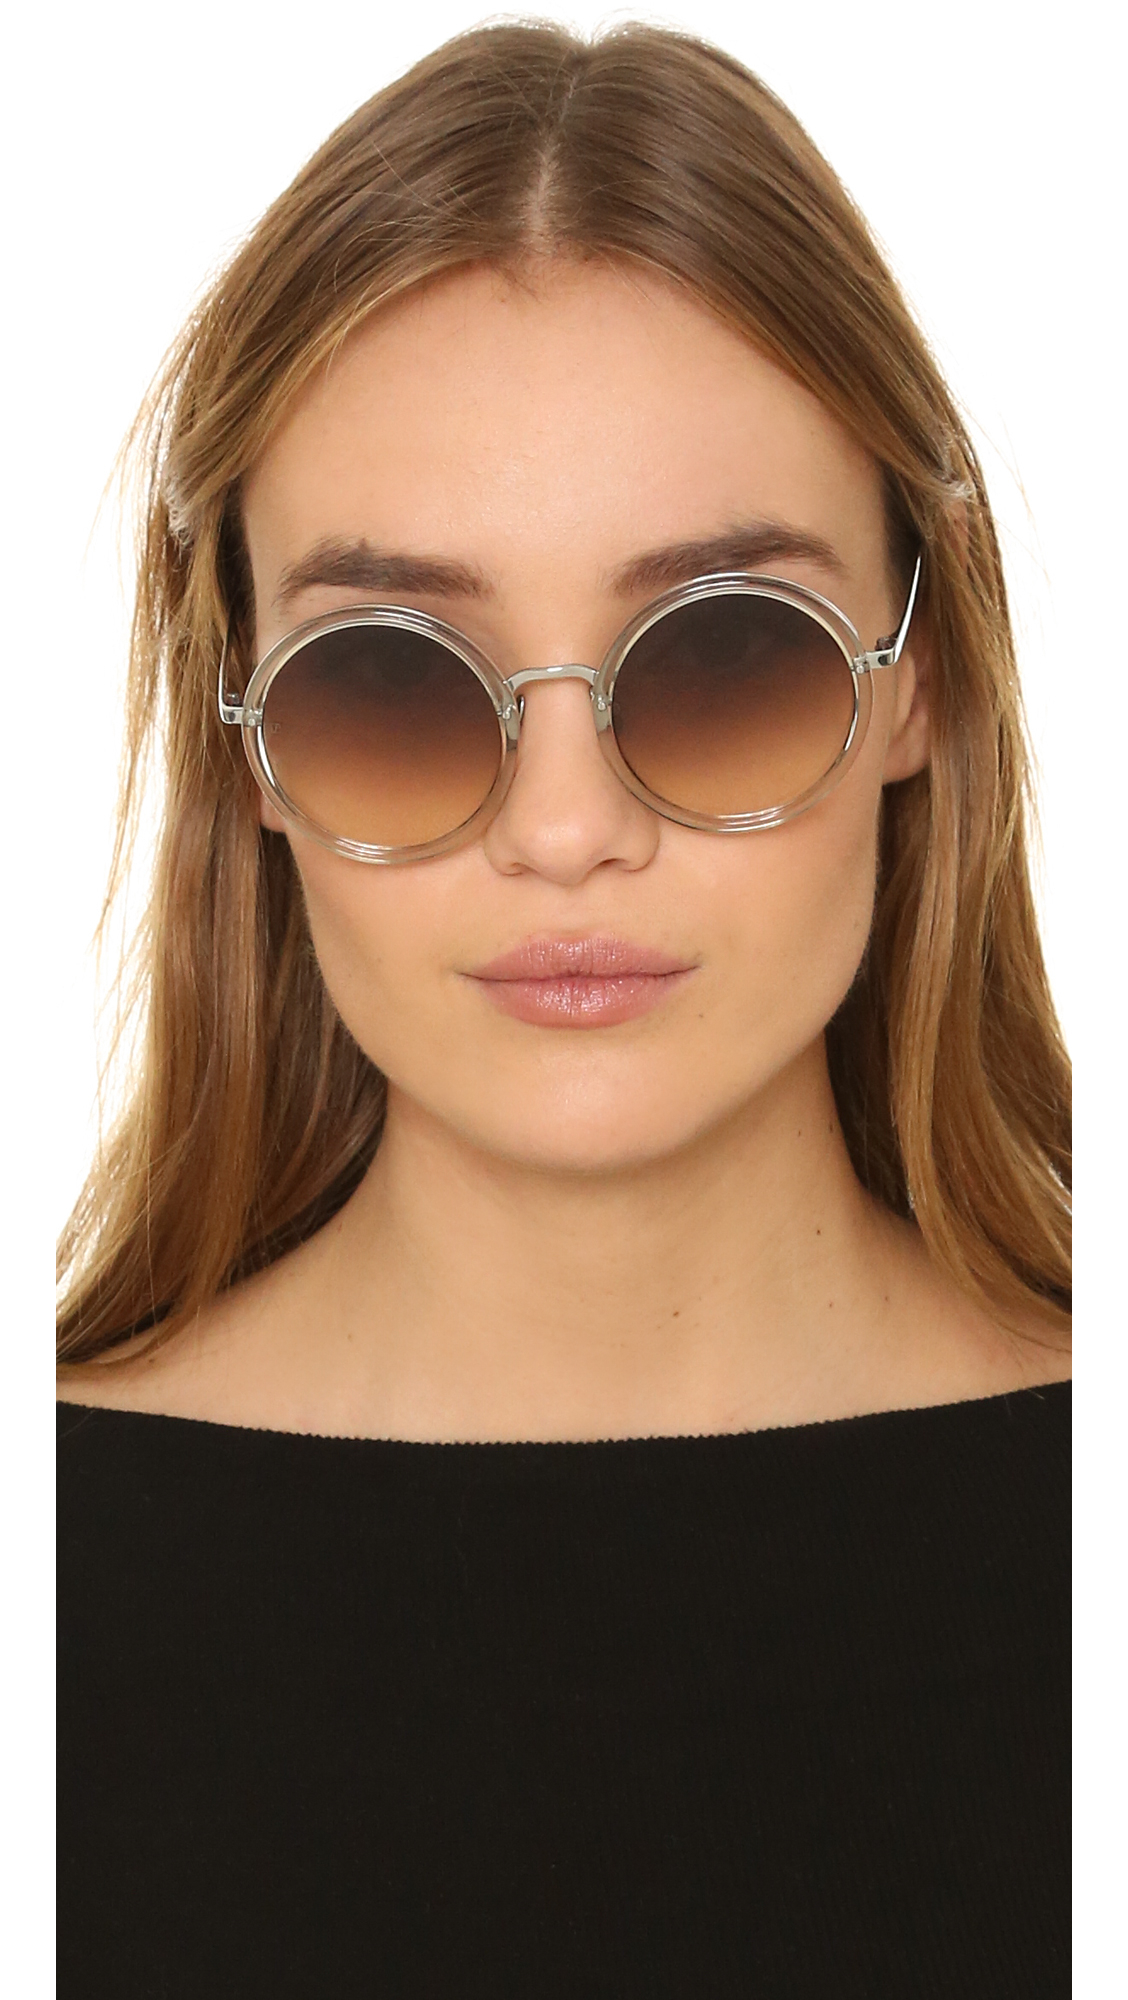 852fd86d9fb4 Lyst - Linda Farrow Round Sunglasses in Brown